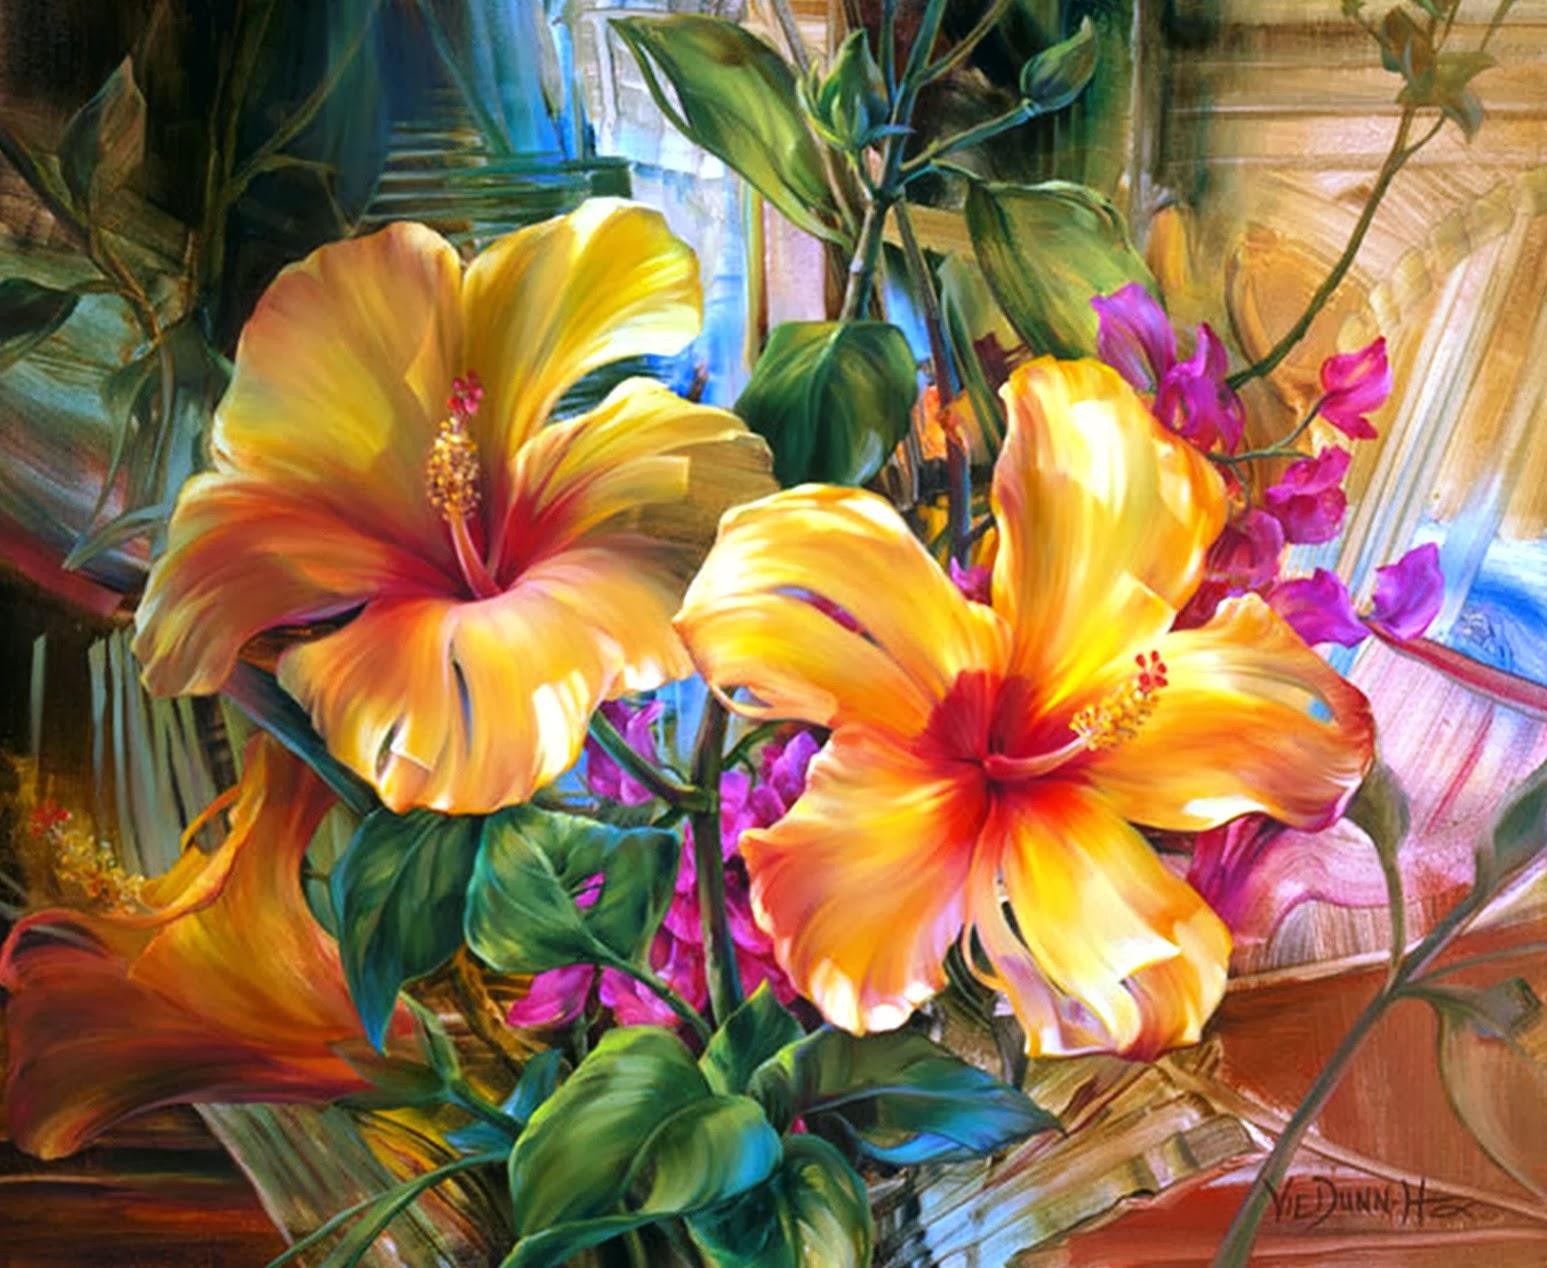 pintura moderna y fotograf a art stica pinturas modernas